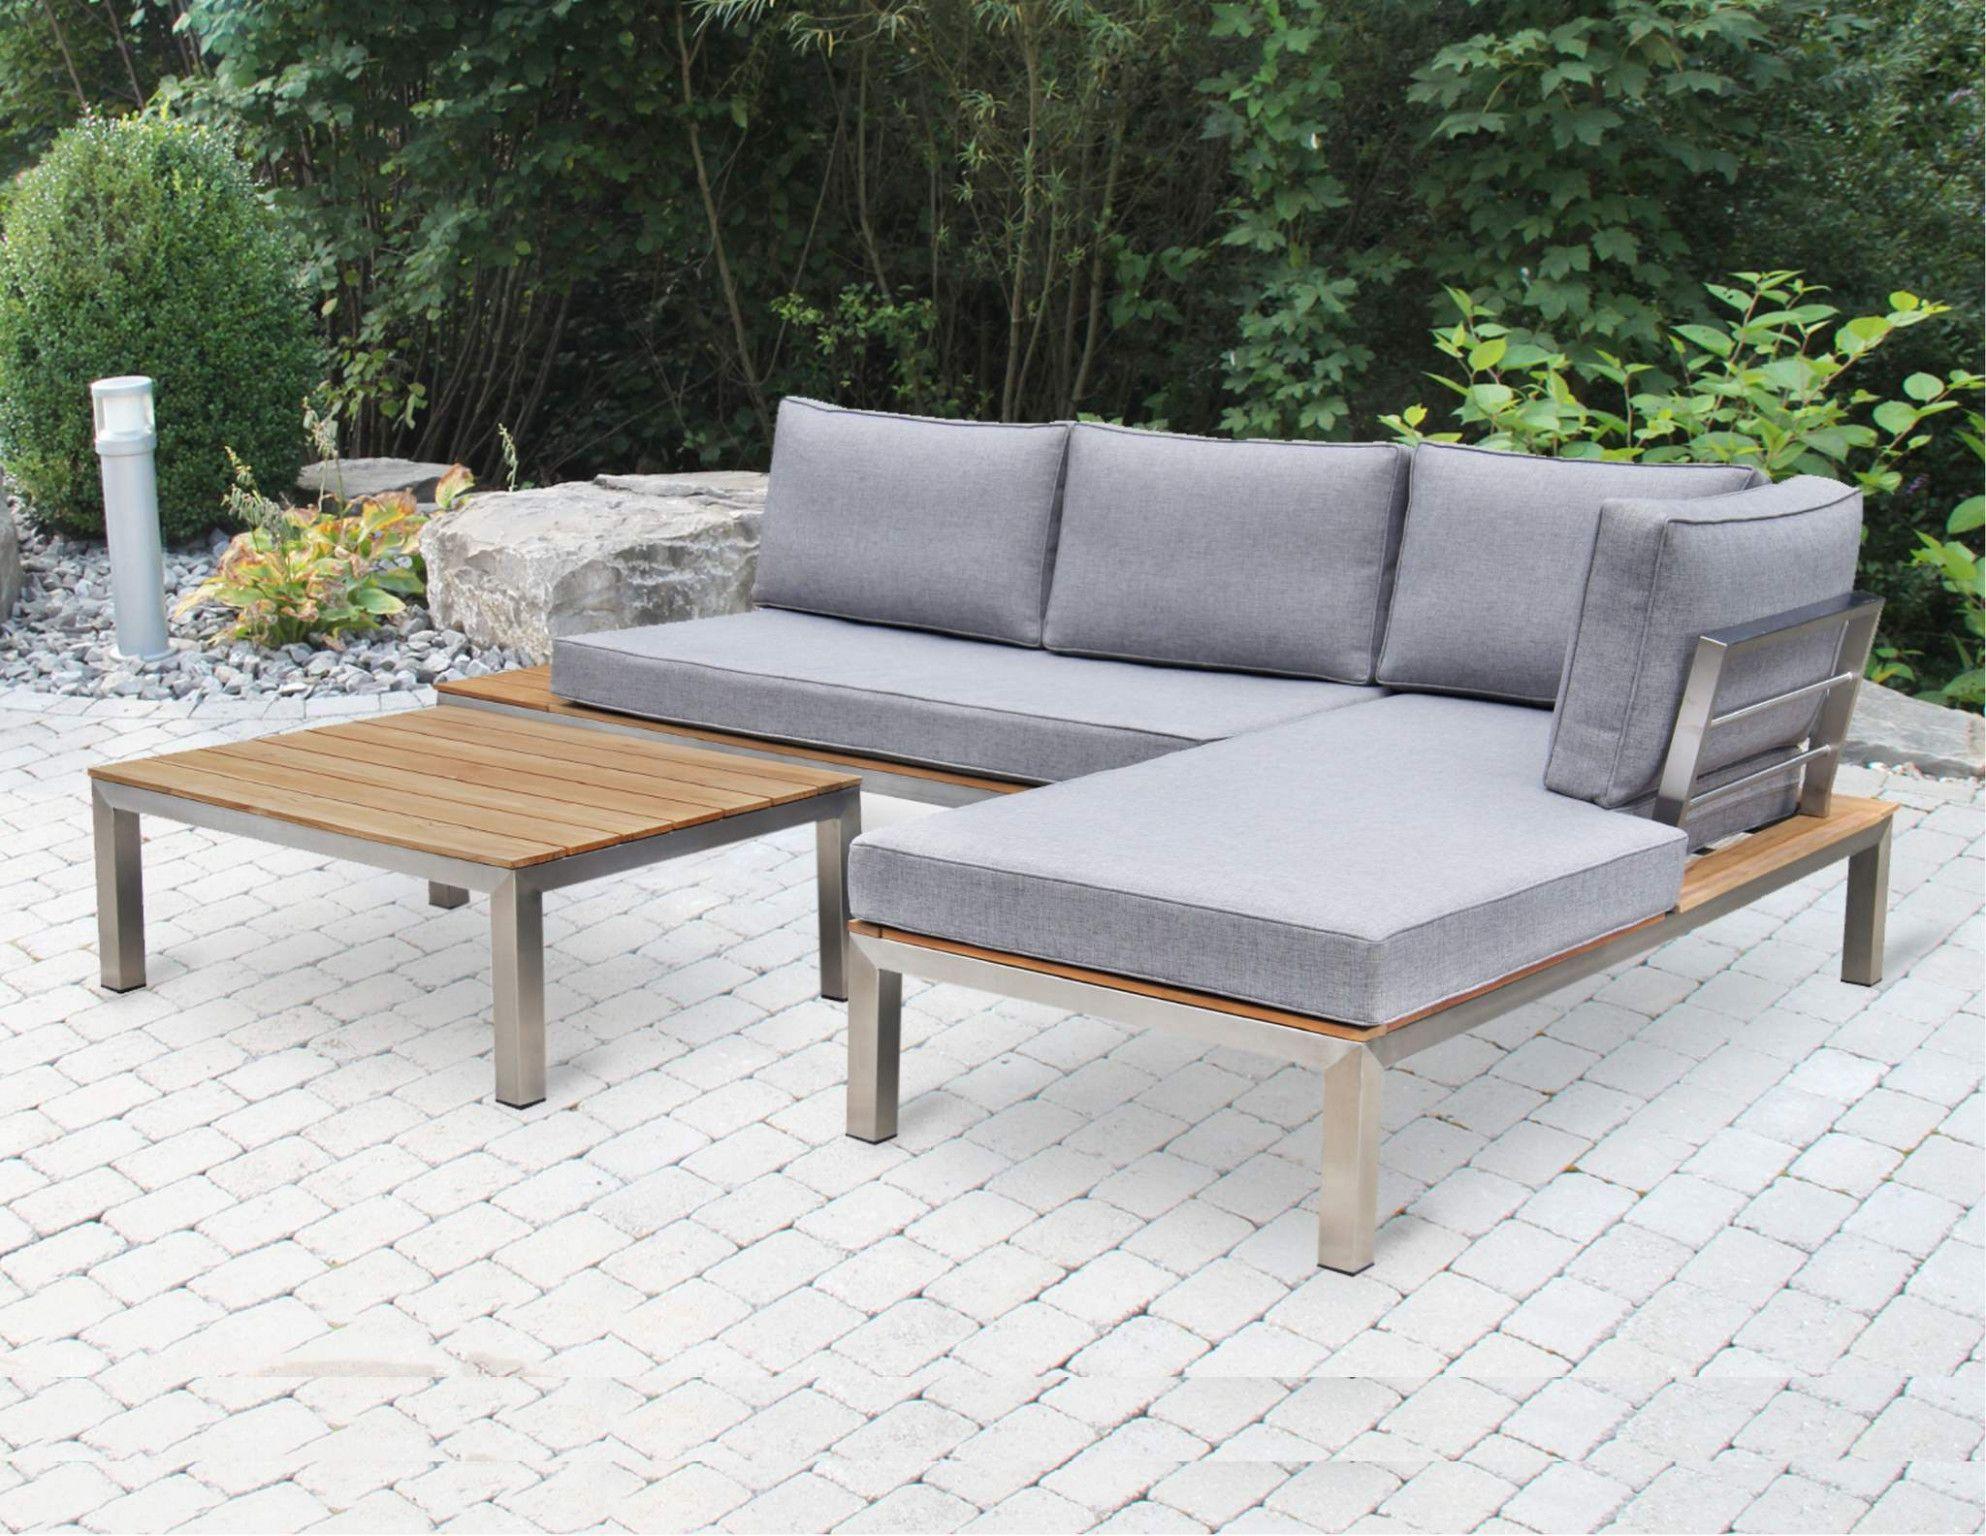 Loungemobel Garten Gunstig Garten Lounge Lounge Sessel Garten Lounge Sofa Garten